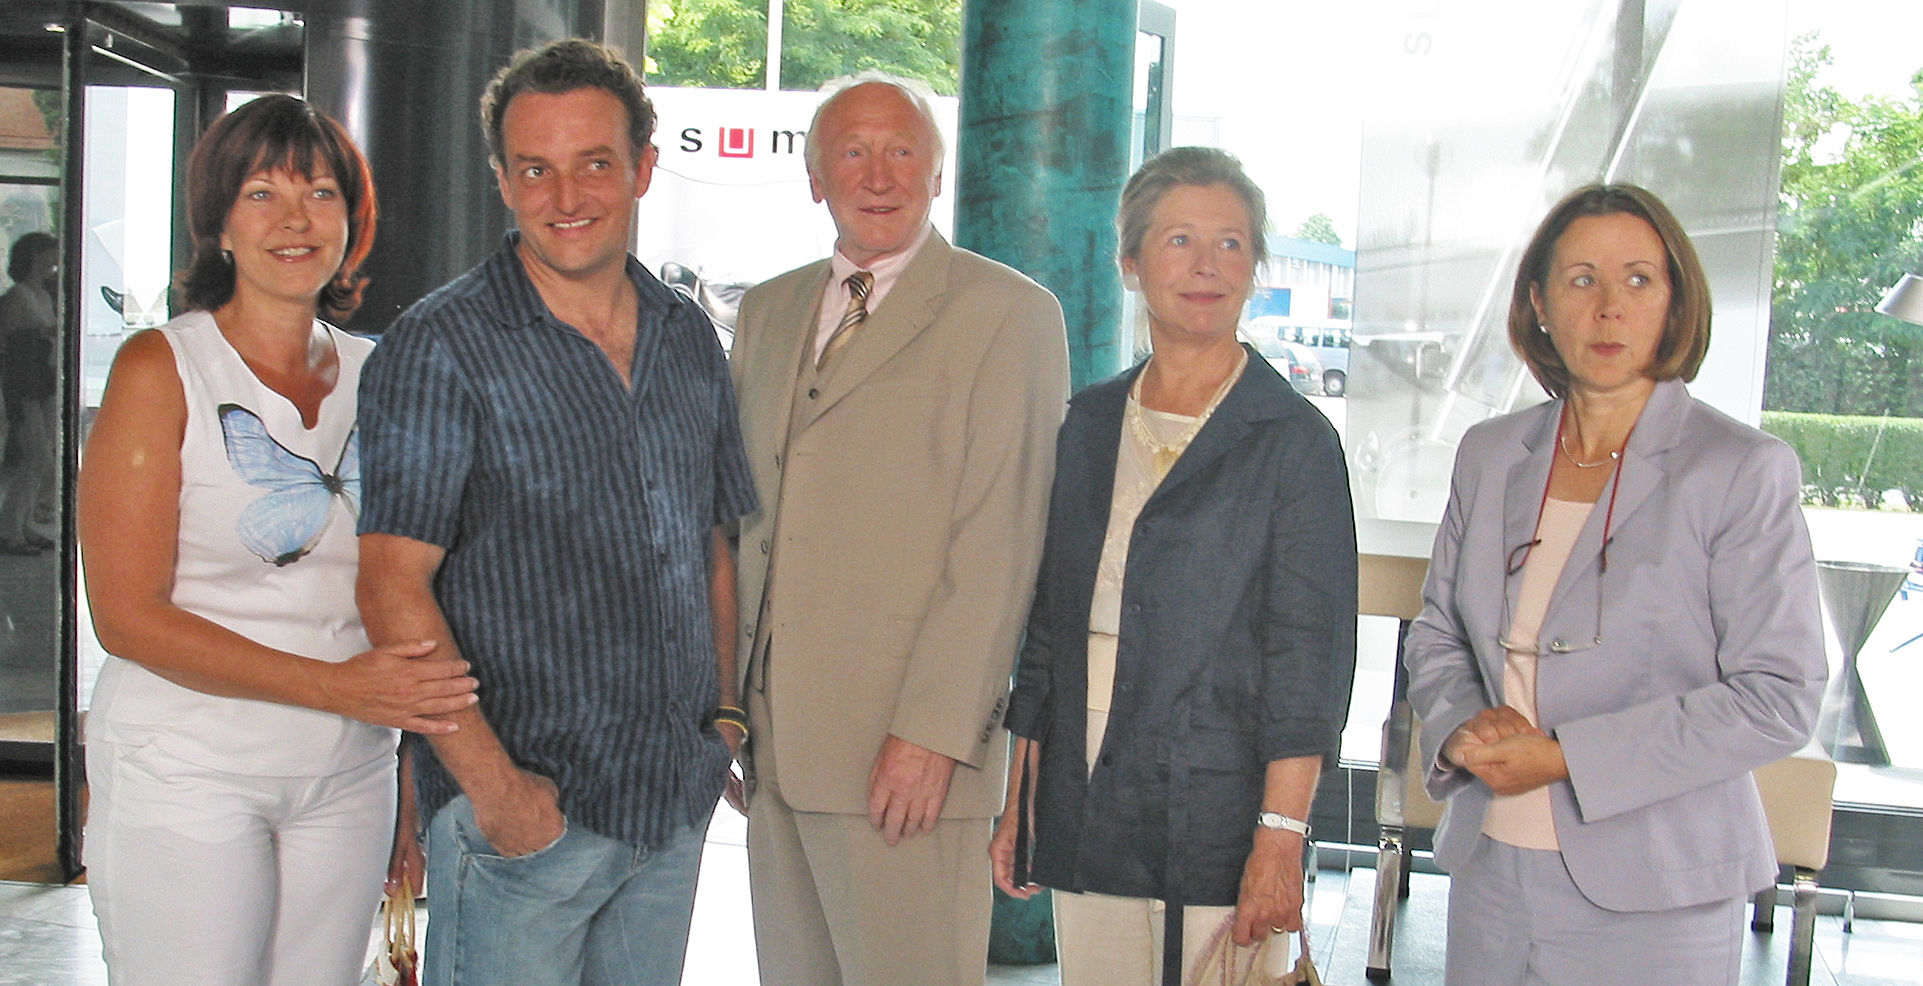 Conny (Elfi Eschke), Freddy (Marco Rima), Paul (Karl Merkatz), Sandra (Helma Gautier), Frau Gold (Uschi Wolff)